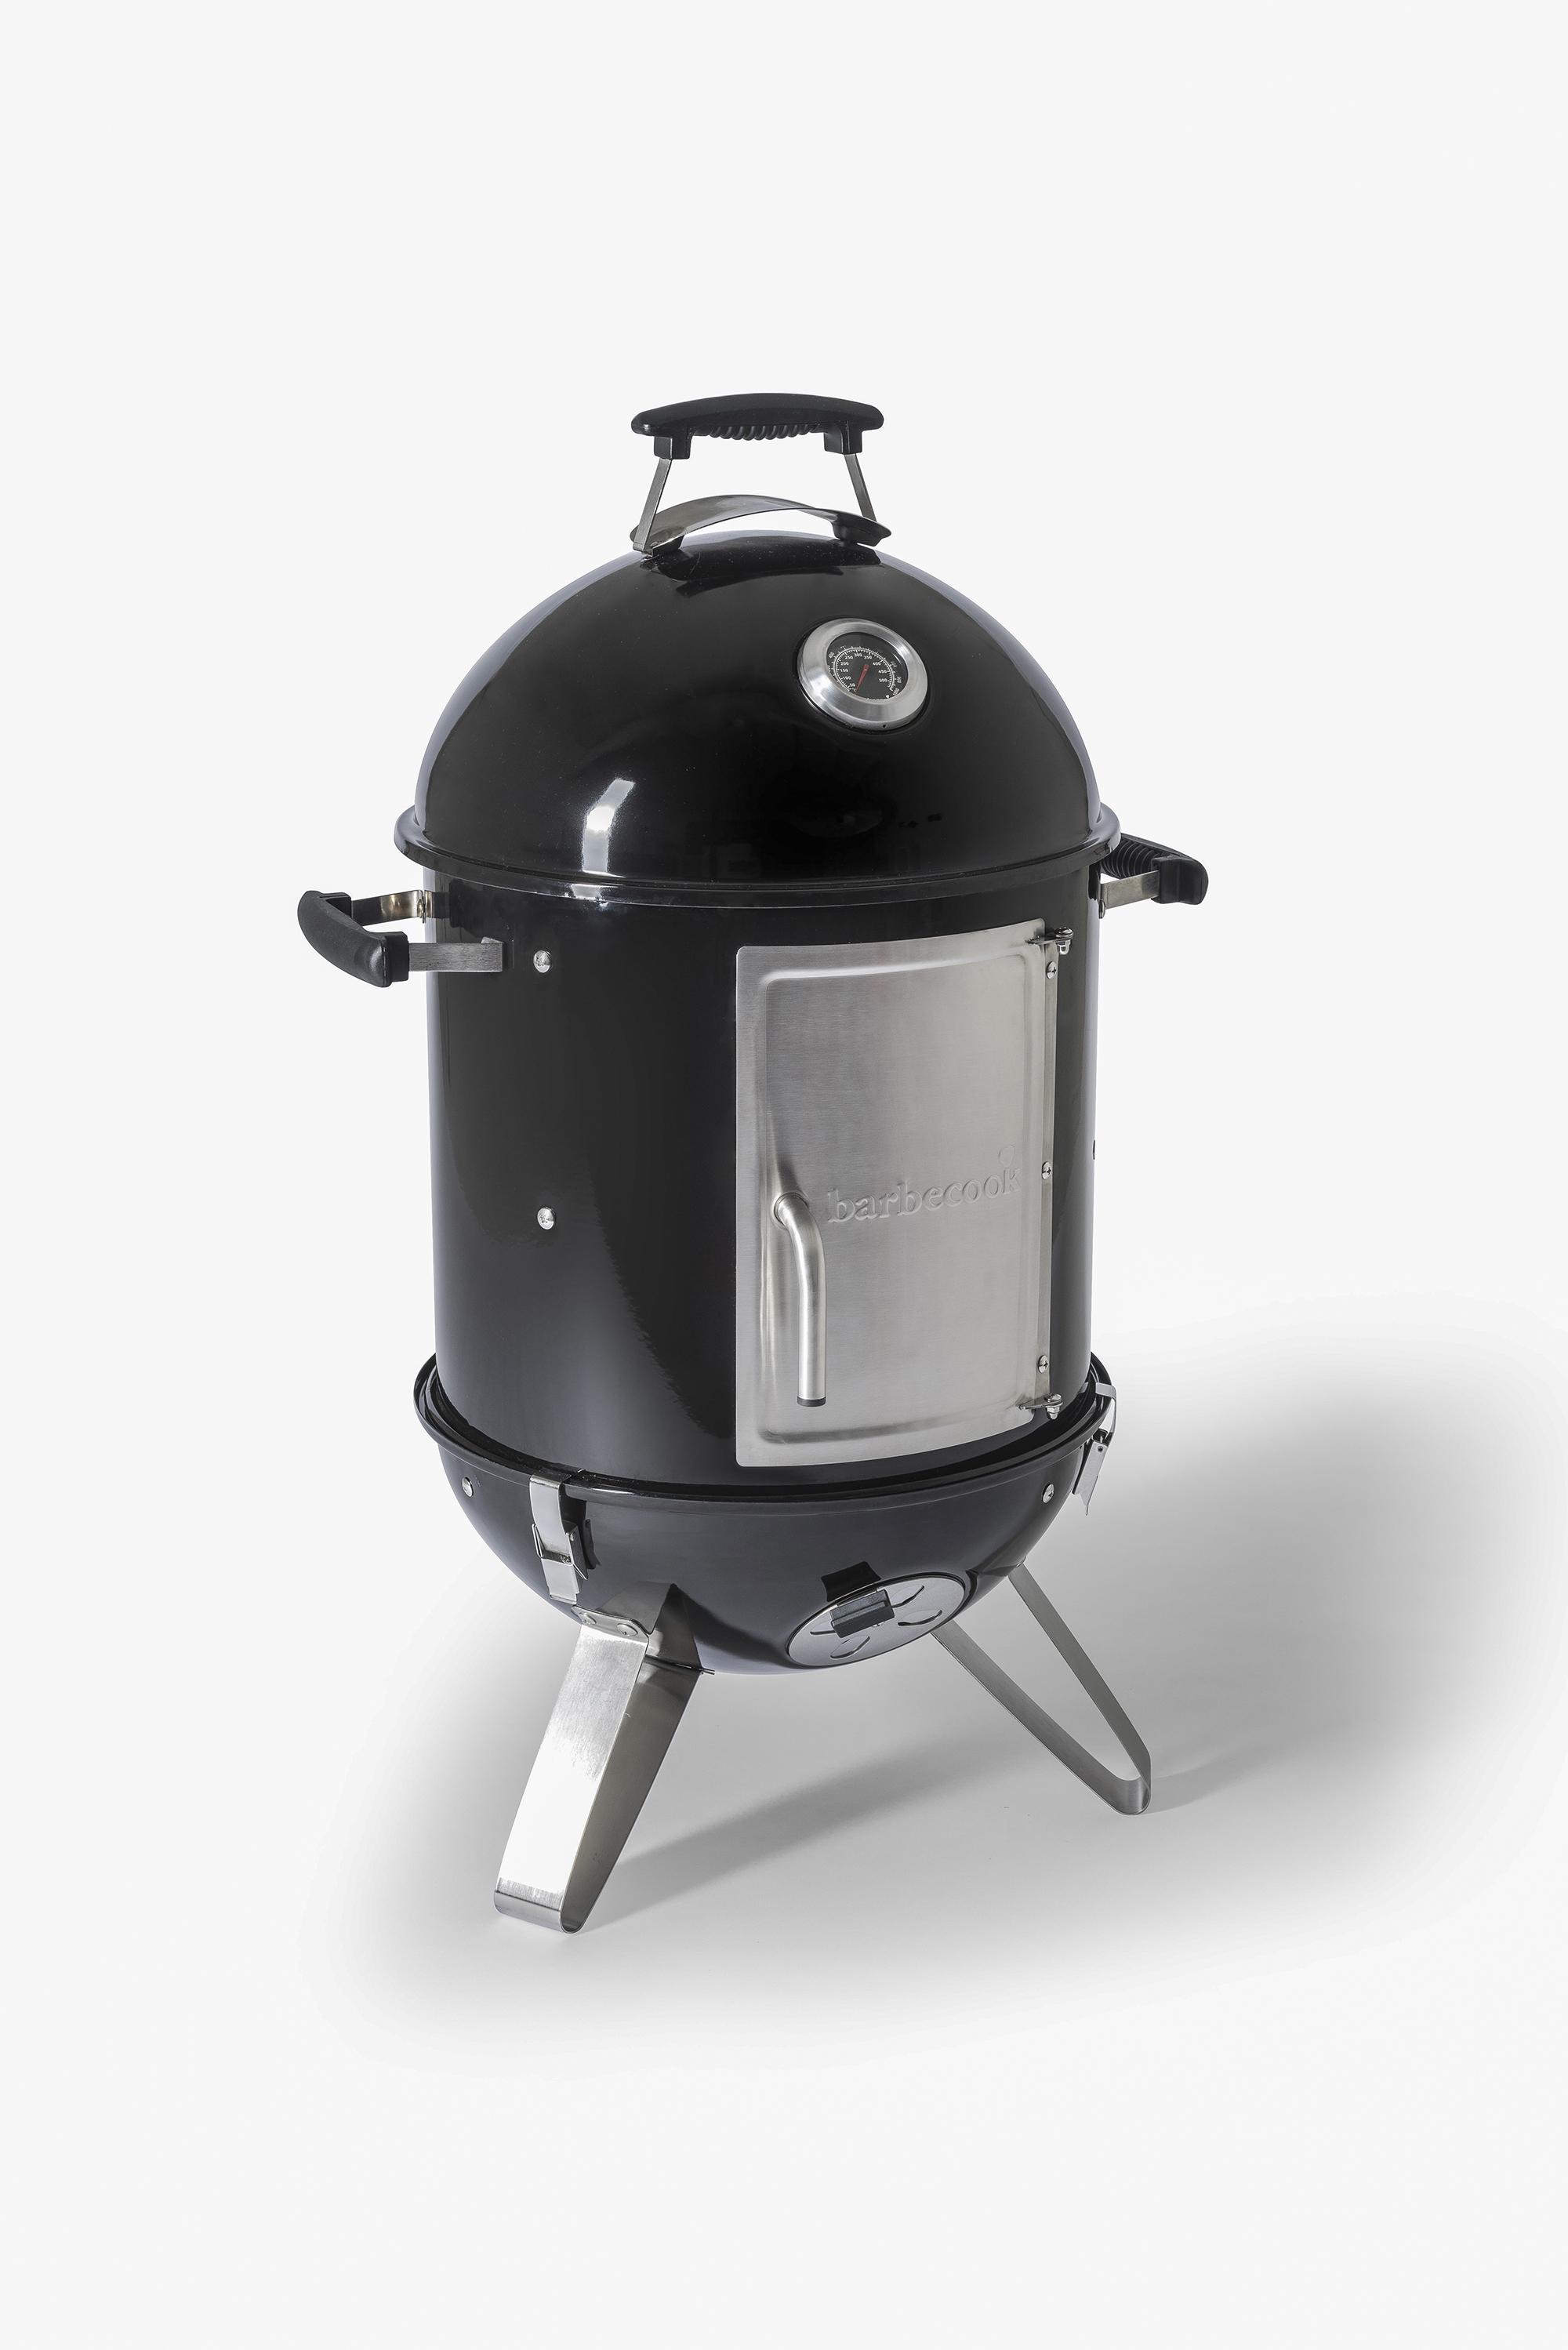 Barbecook Oskar S smoker made of enamel black Ø 40